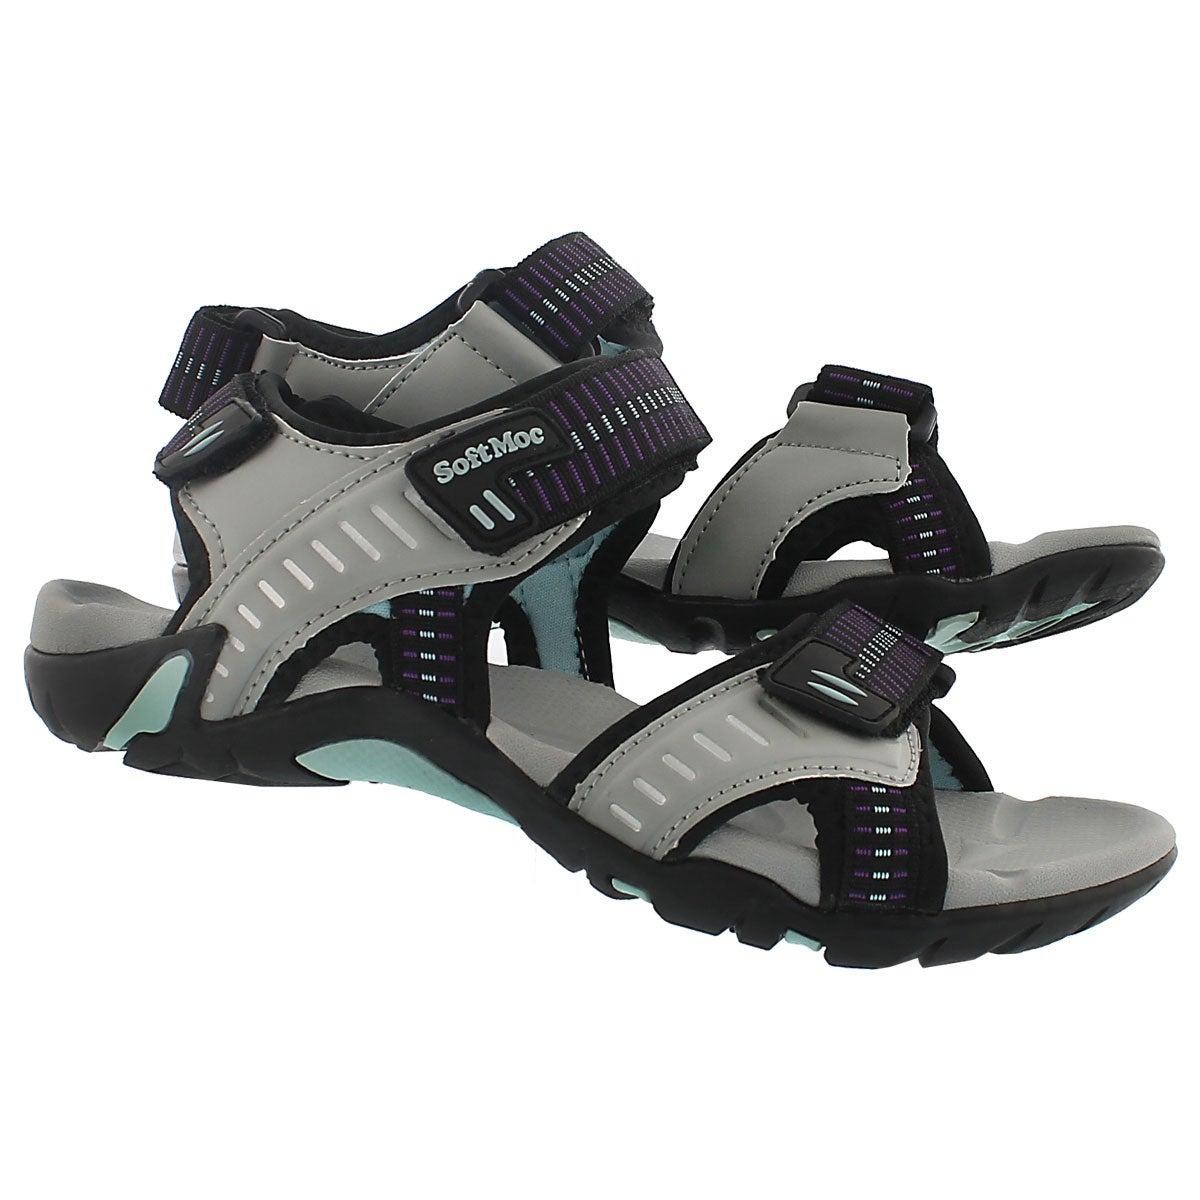 Lds Kara grey 3 strap sport sandal